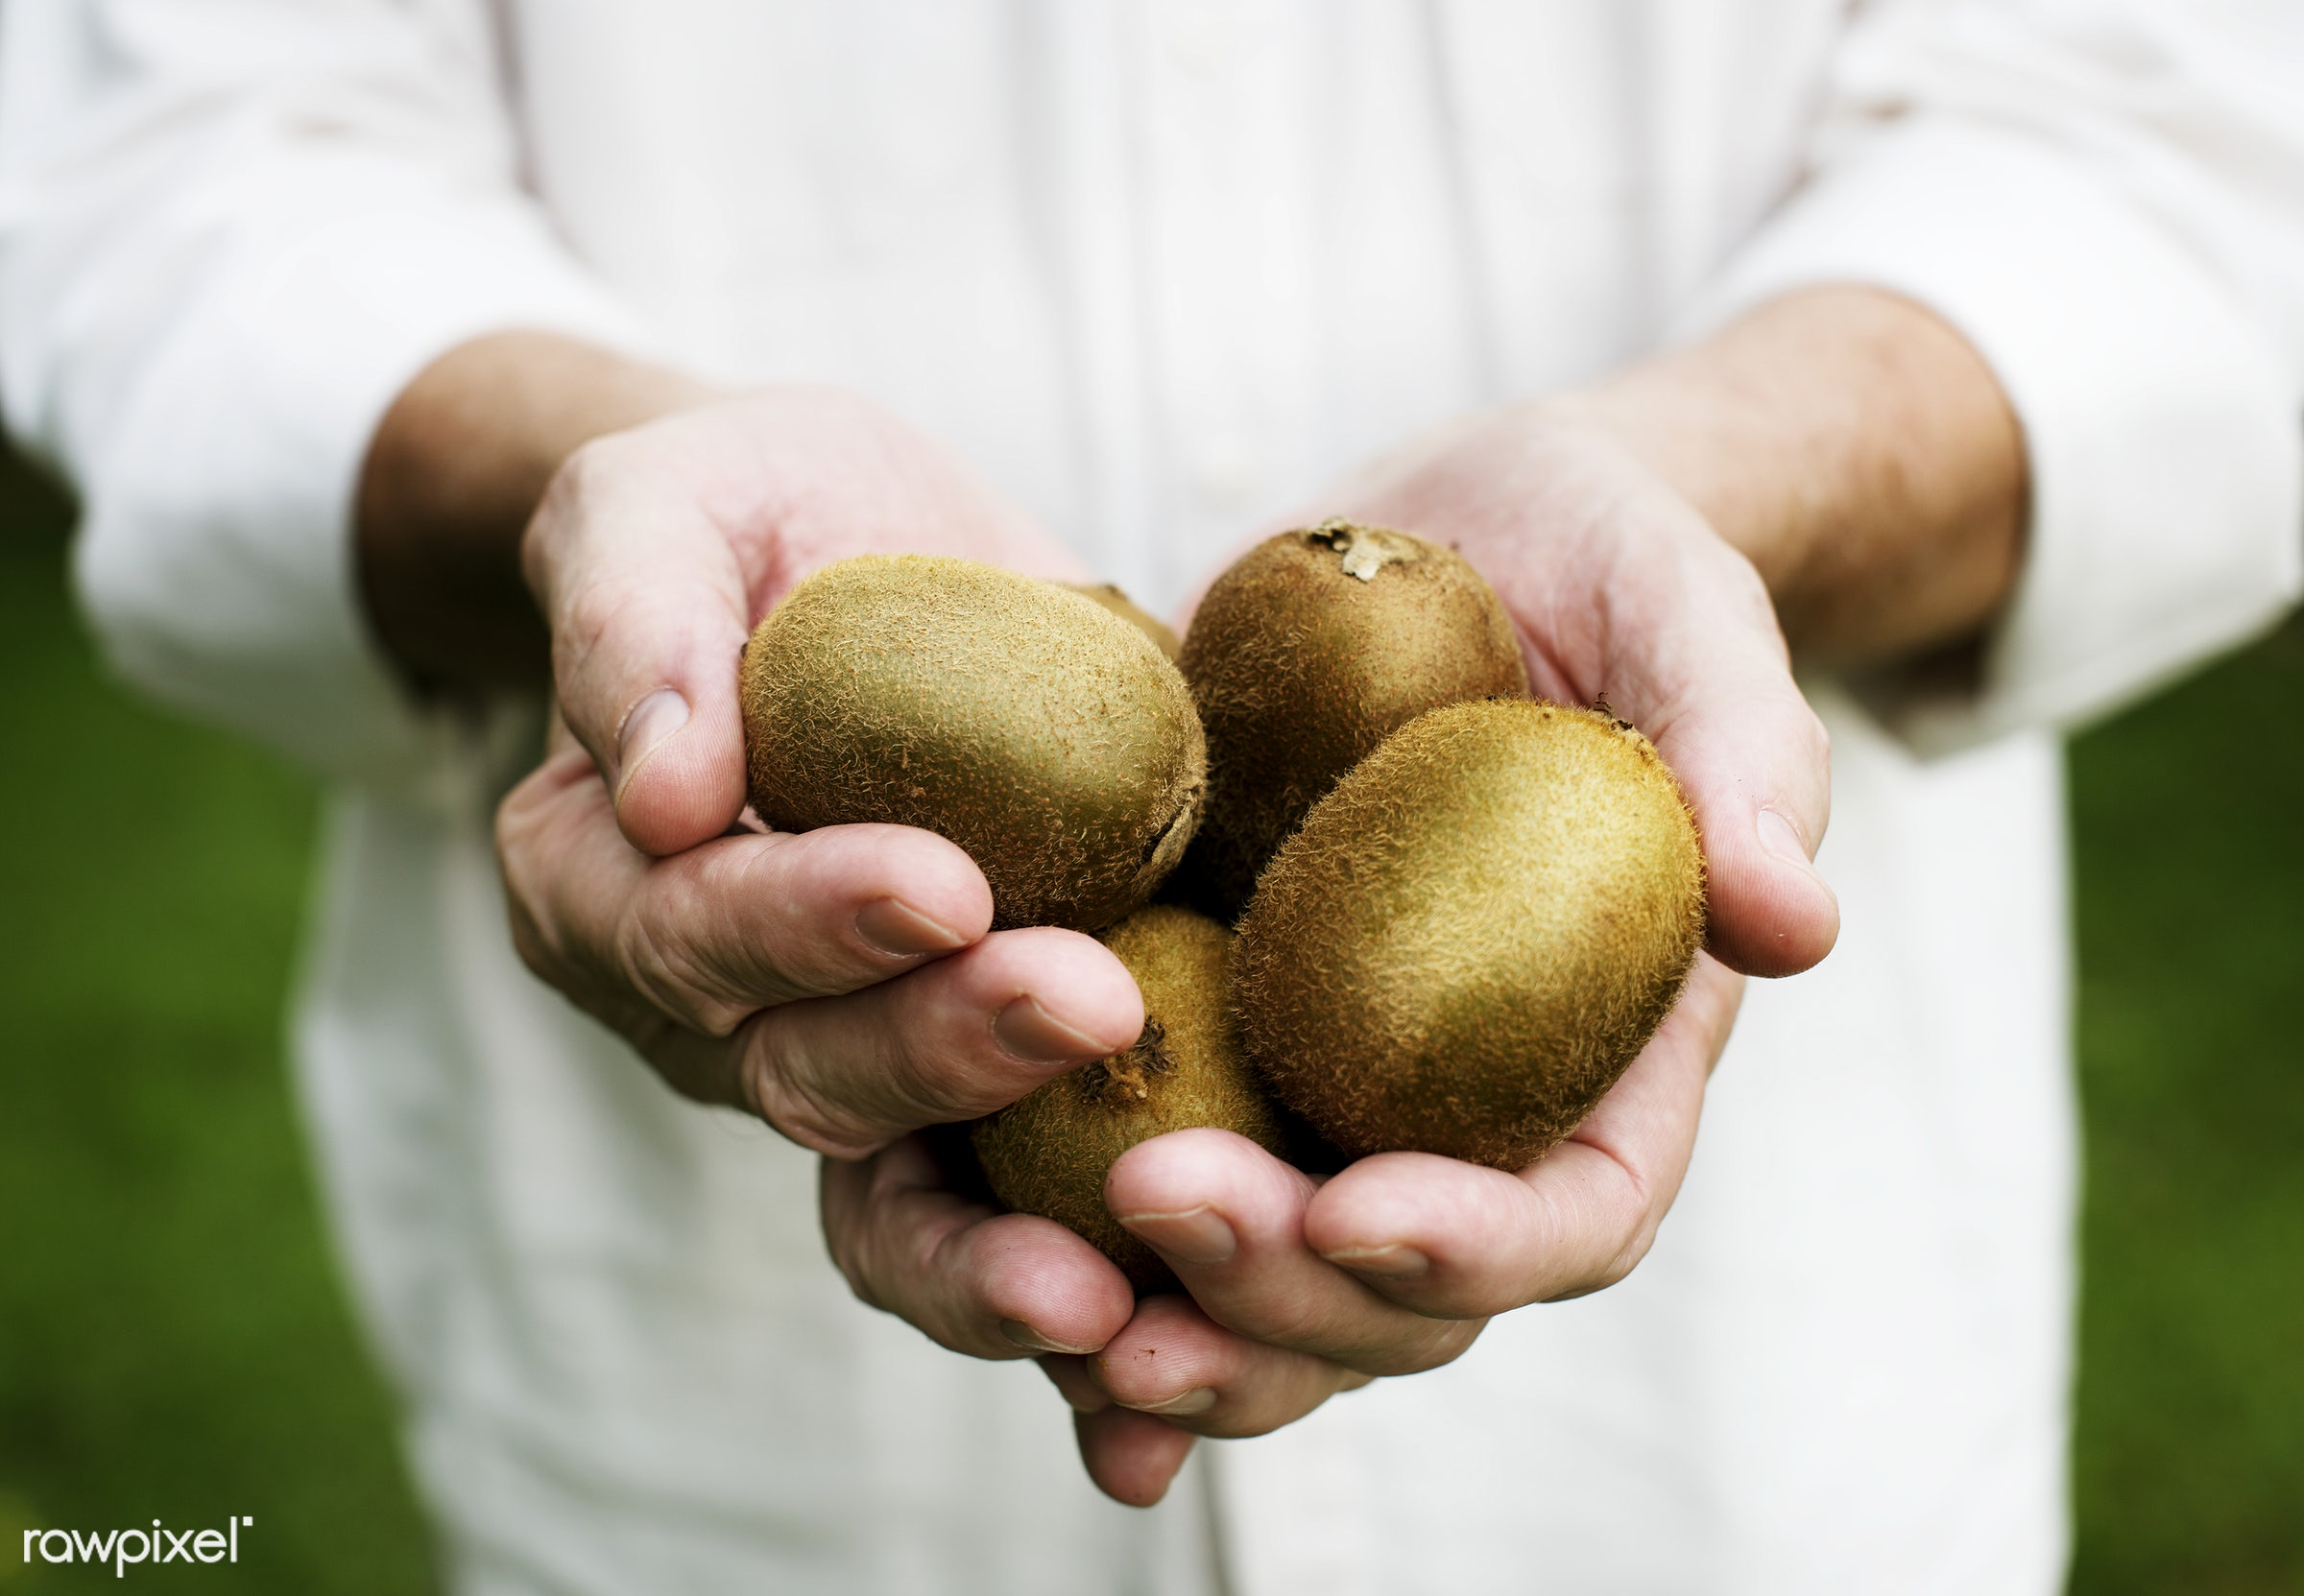 raw, holding, farm, nature, hands, fresh, kiwi, closeup, fruit, organic, healthy, harvest, produce